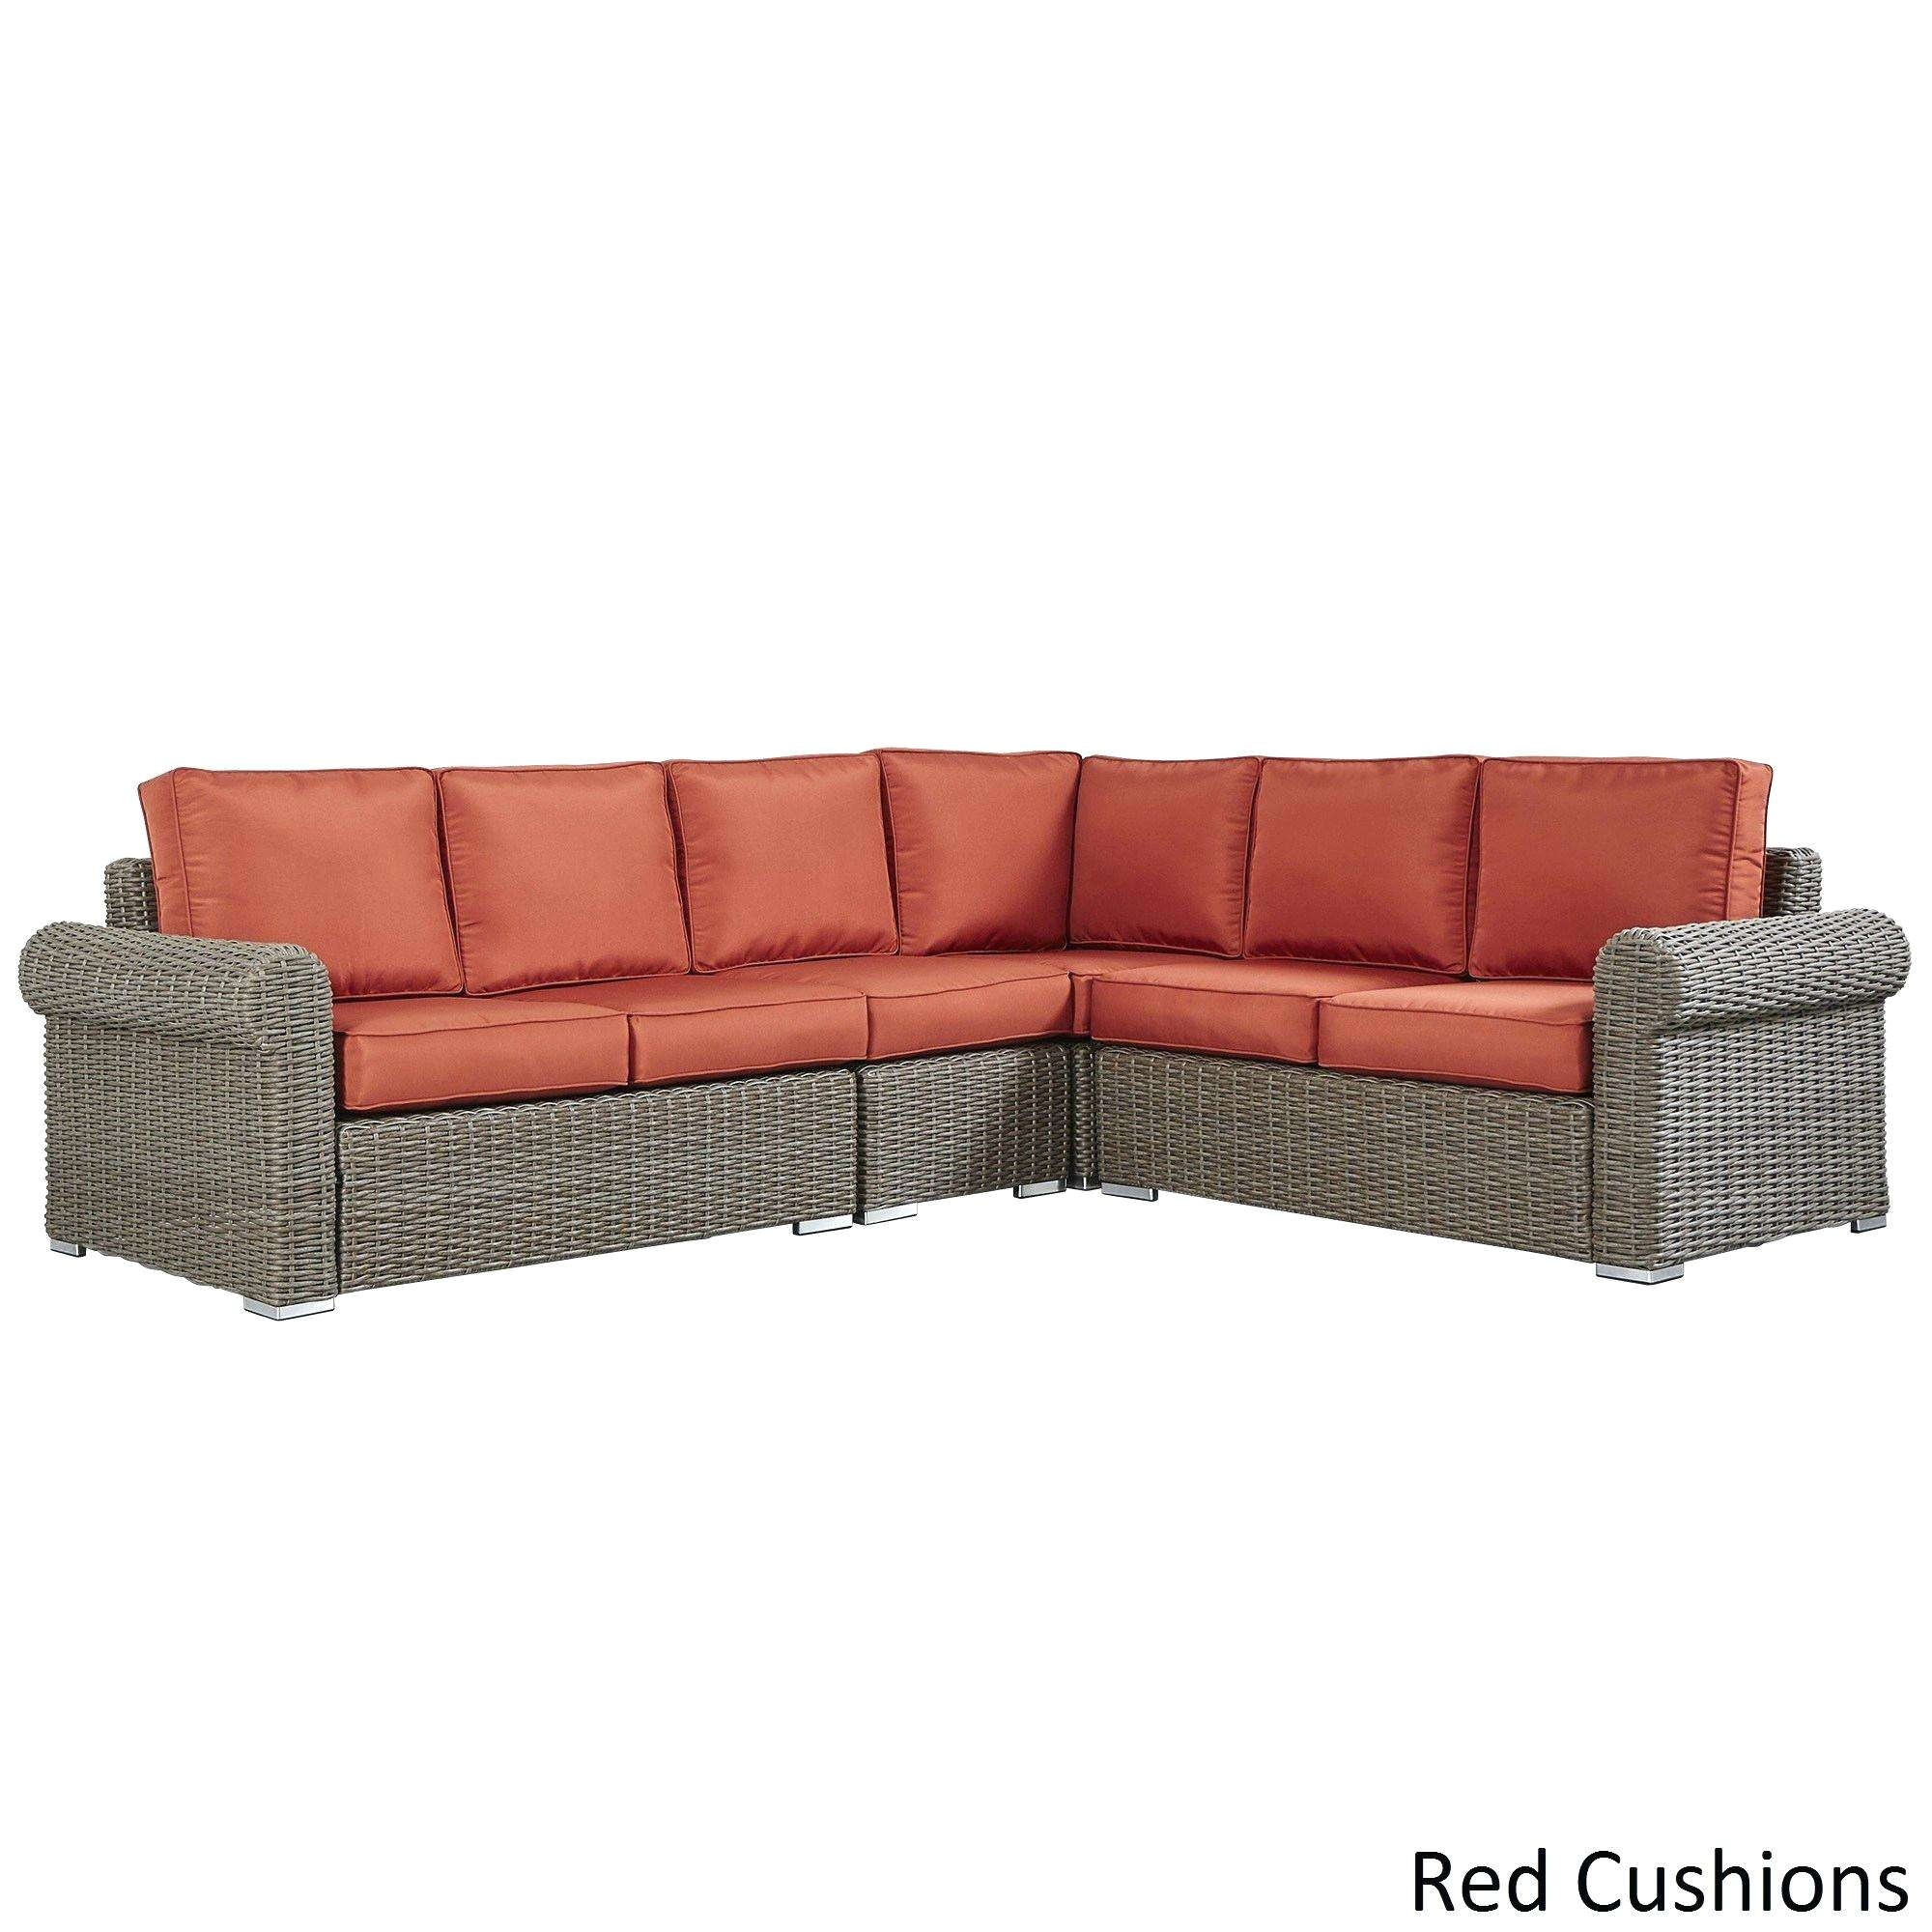 red desk chair walmart beautiful storage ottoman bench luxury wicker outdoor sofa 0d patio chairs